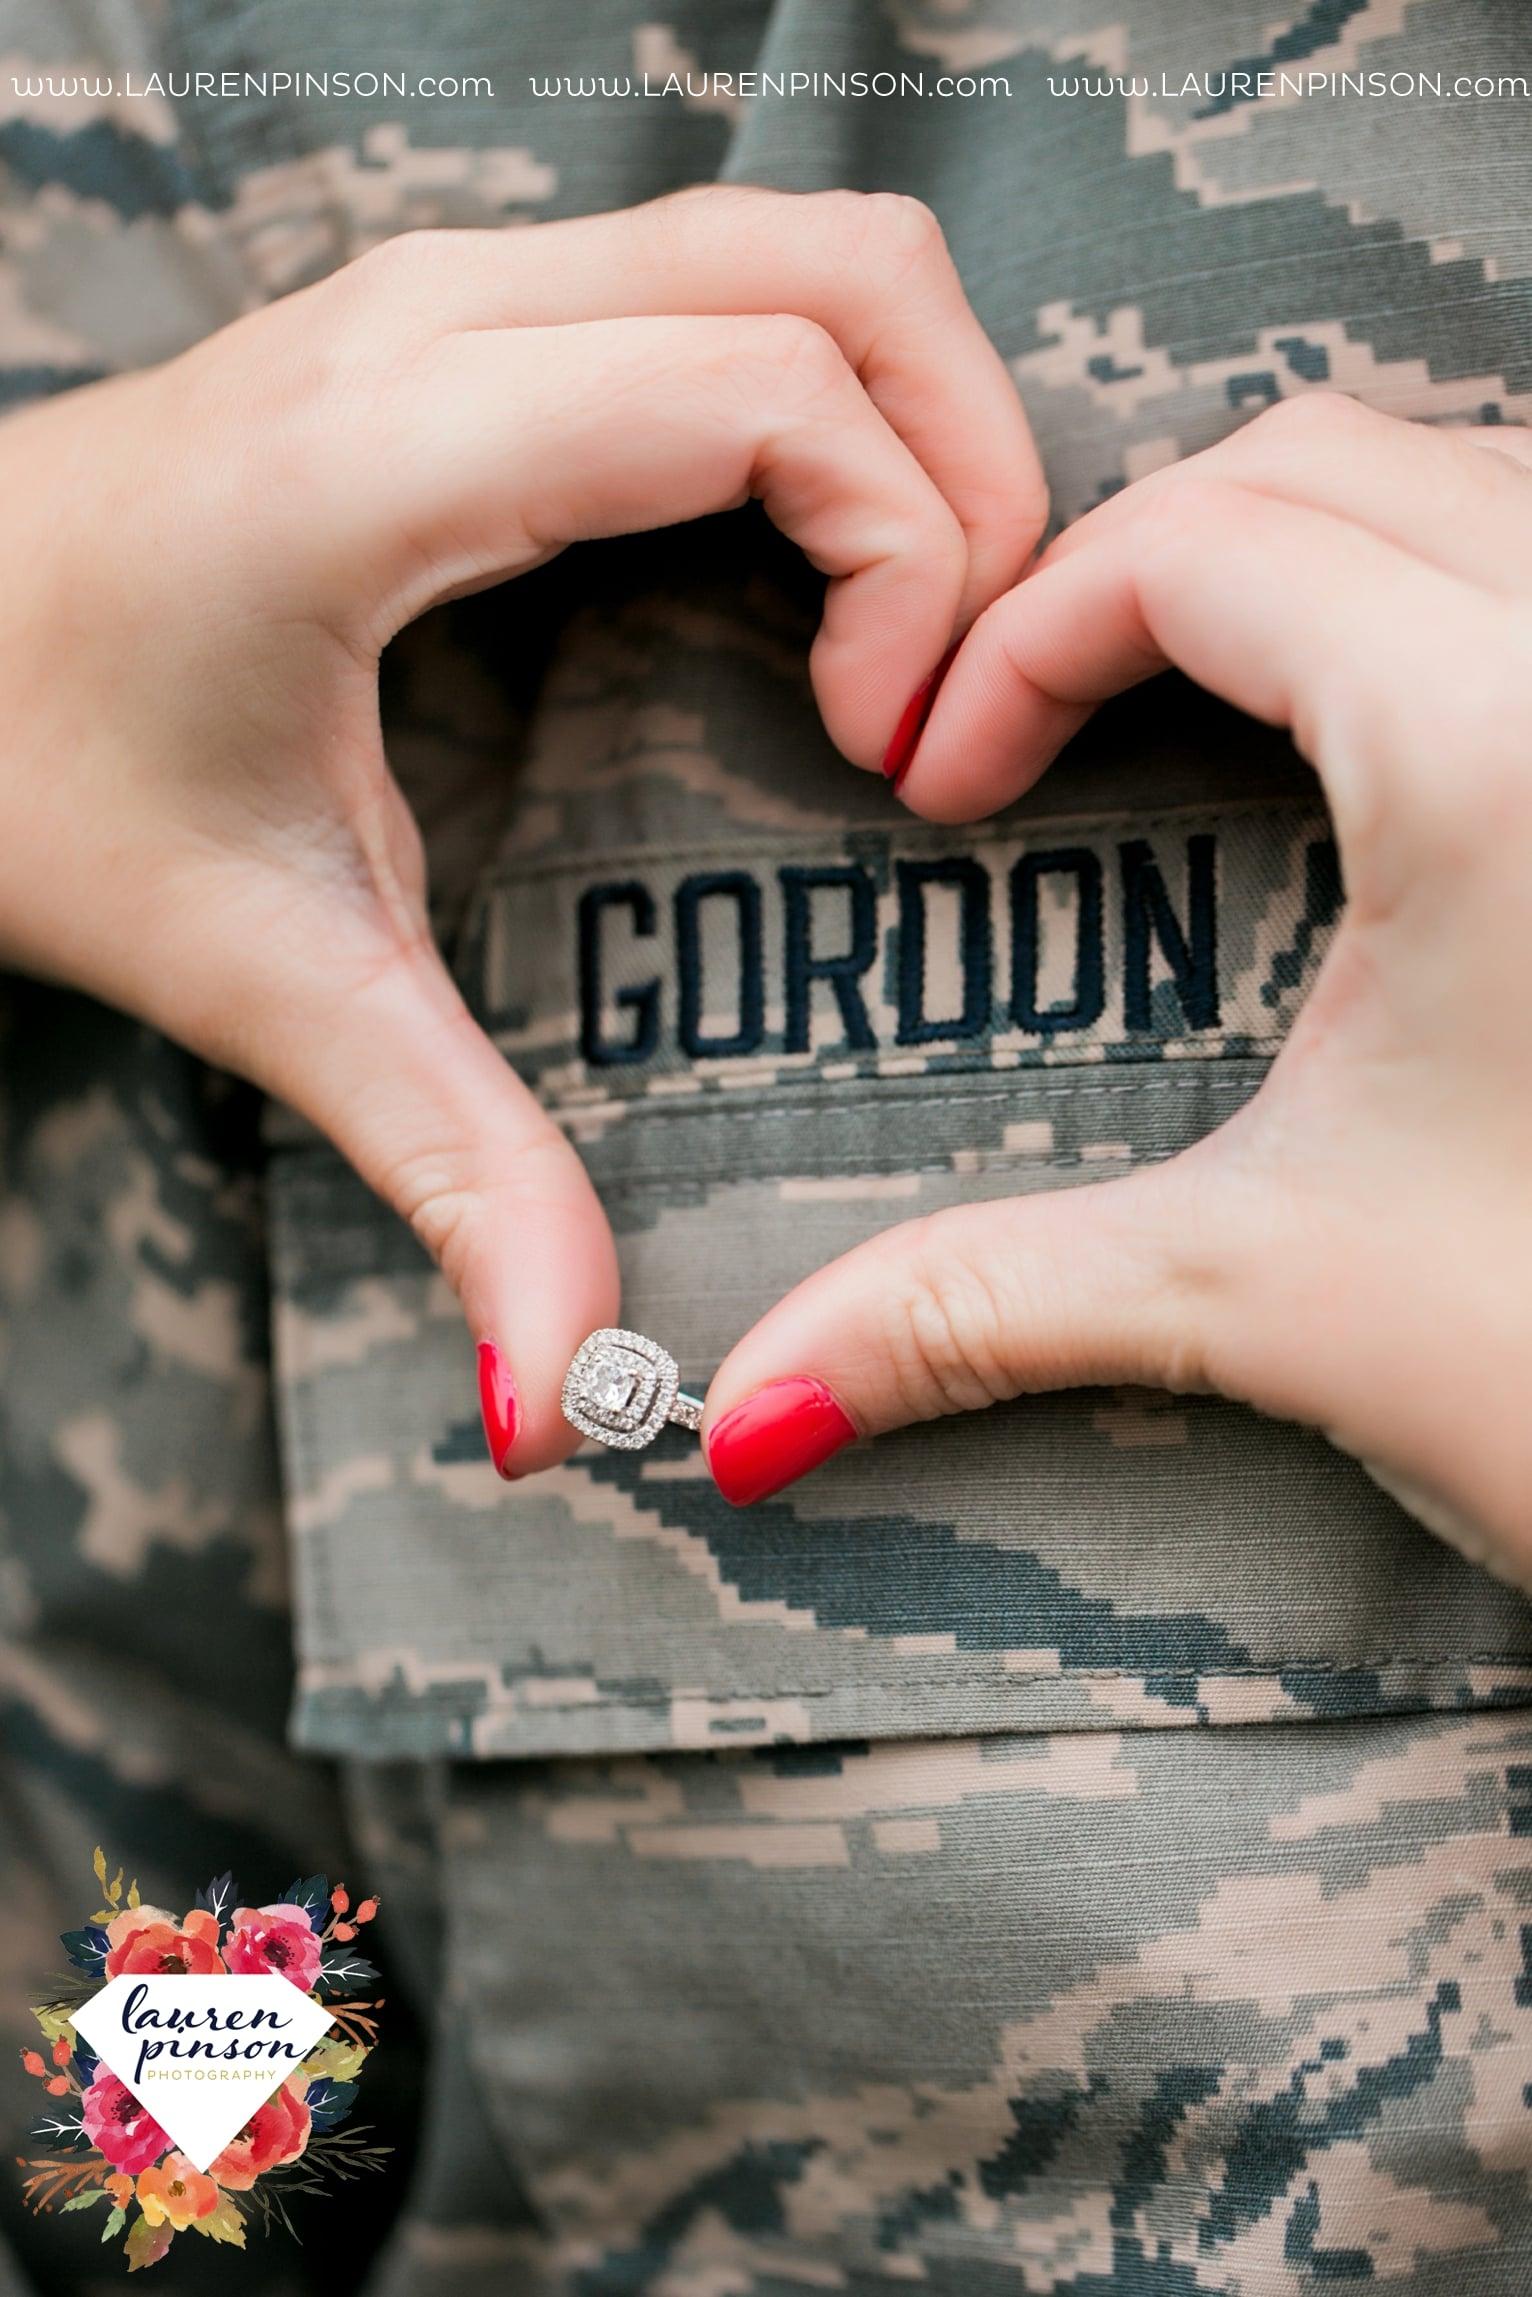 sheppard-afb-wichita-falls-engagement-session-airmen-in-uniform-abu-airplanes-bride-engagement-ring-texas-air-force-base_2000.jpg